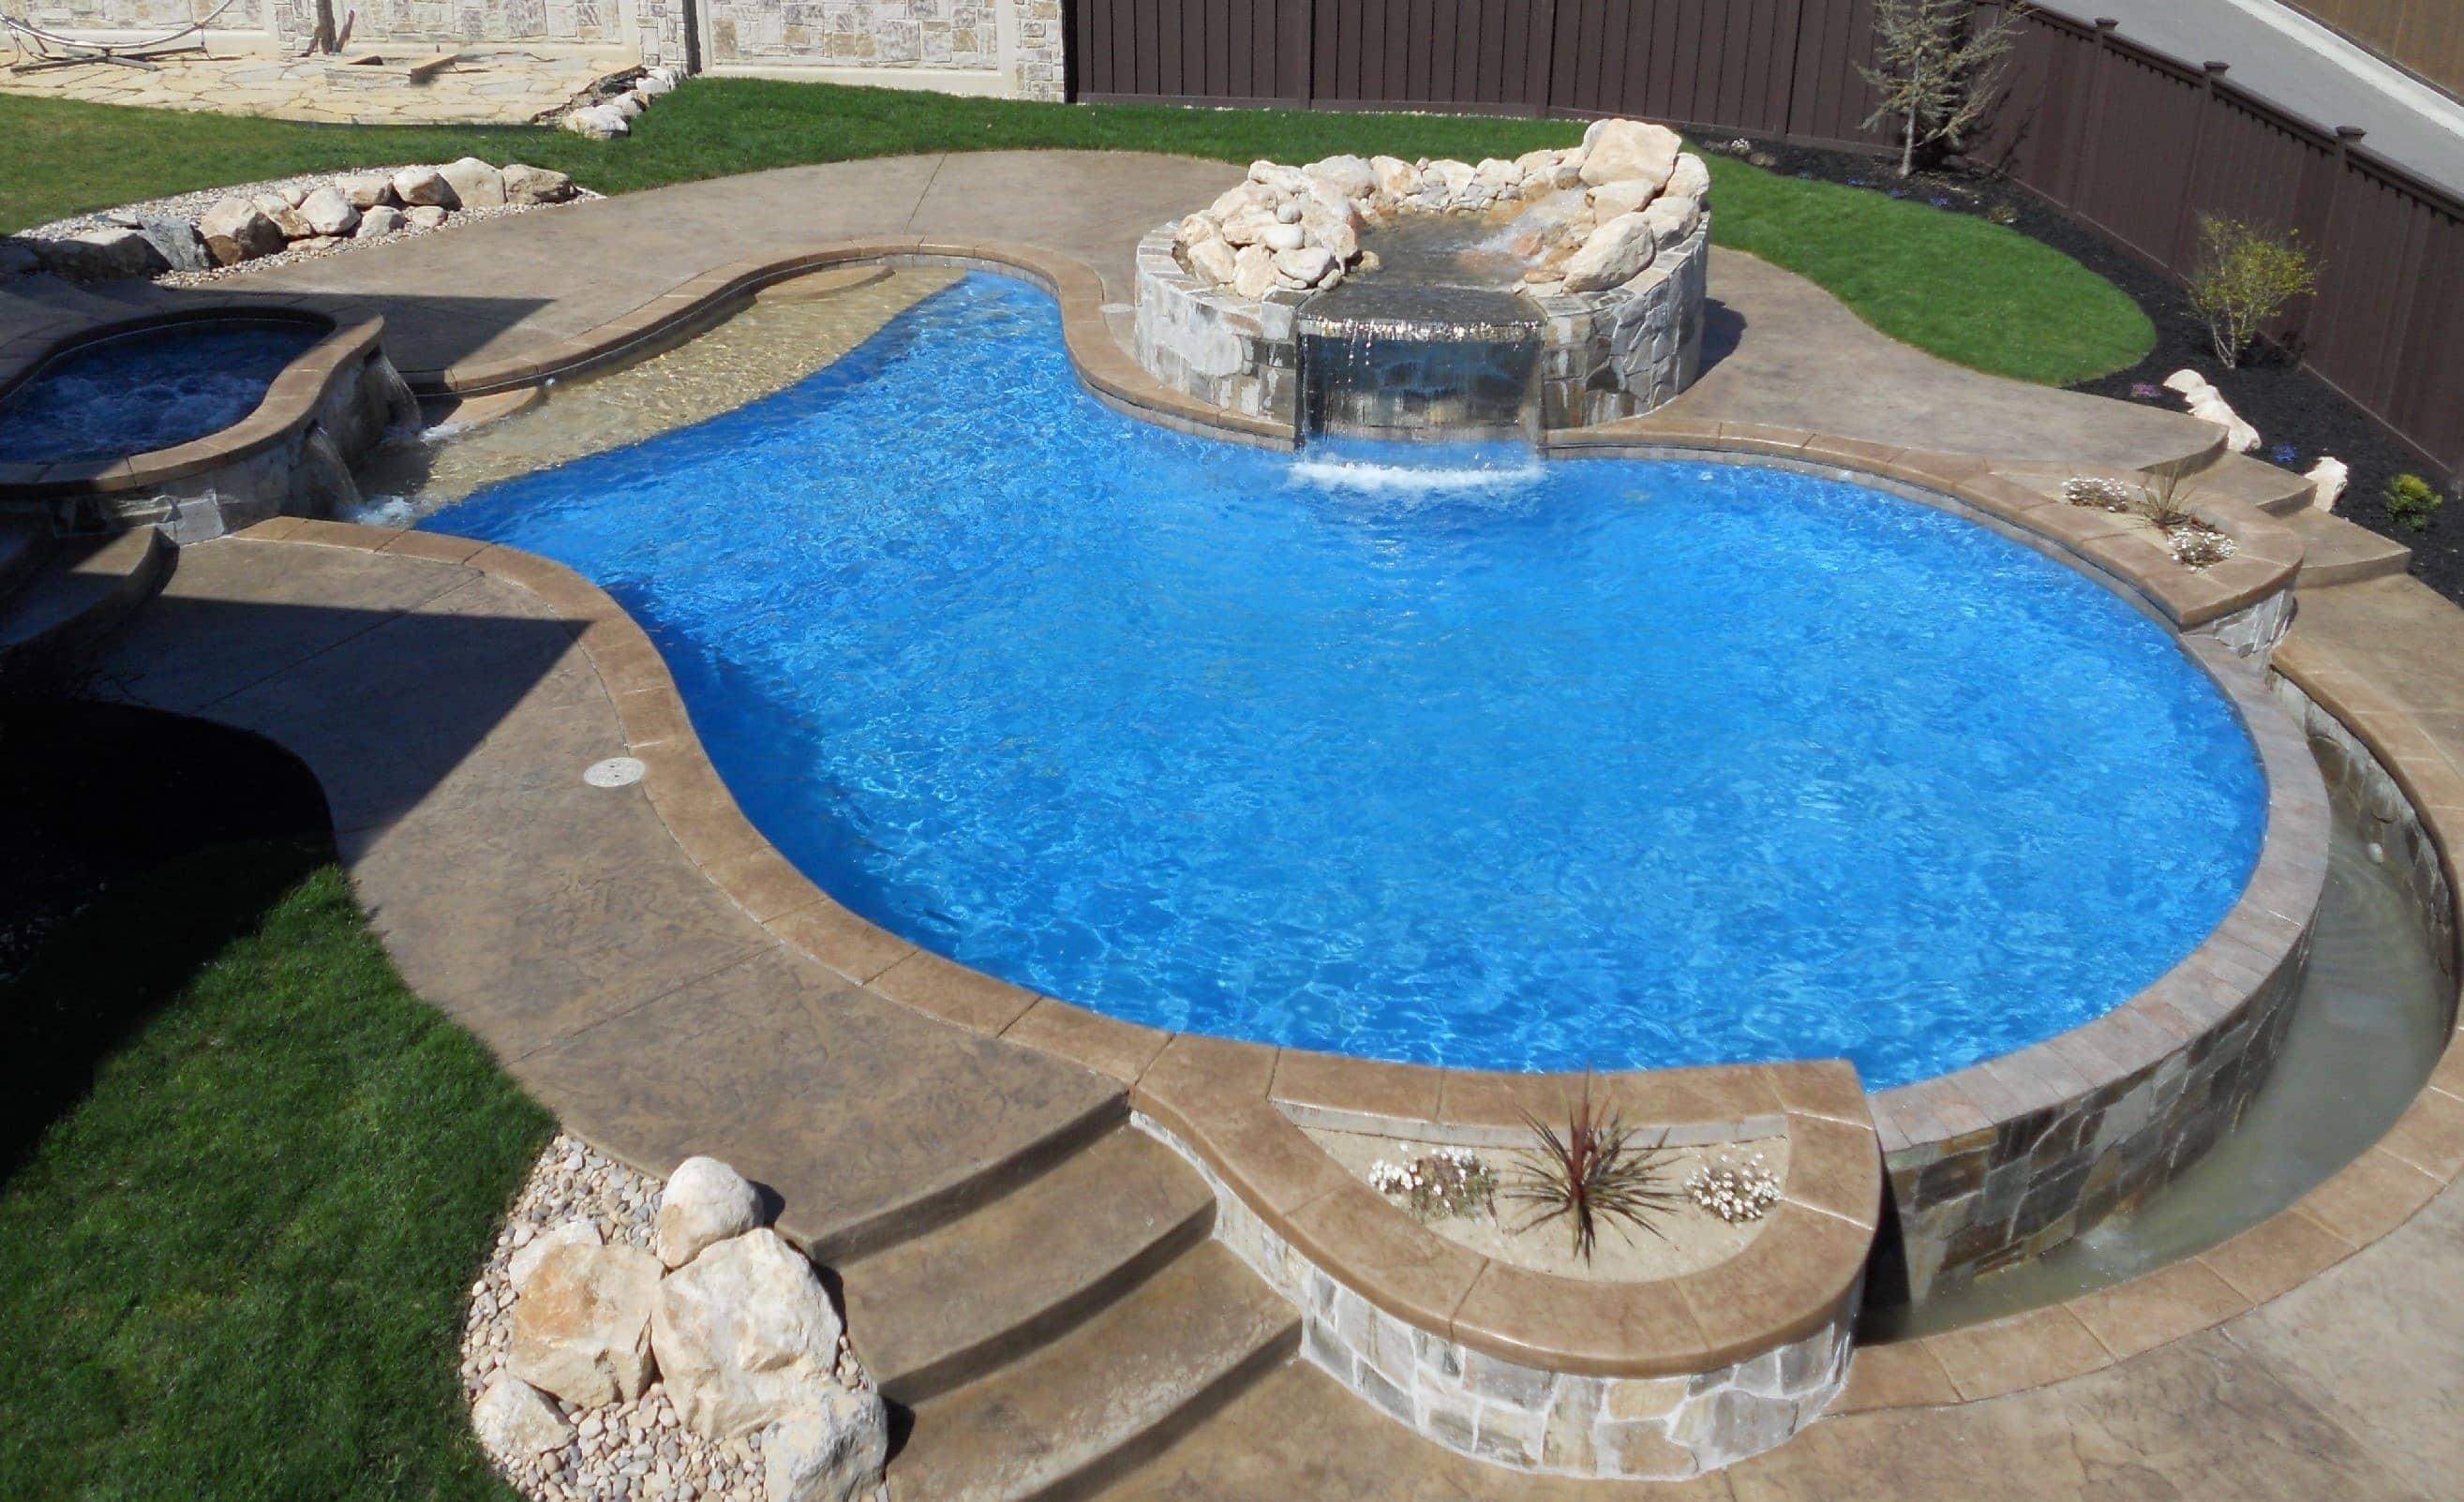 Texas Trophy Pools image 20